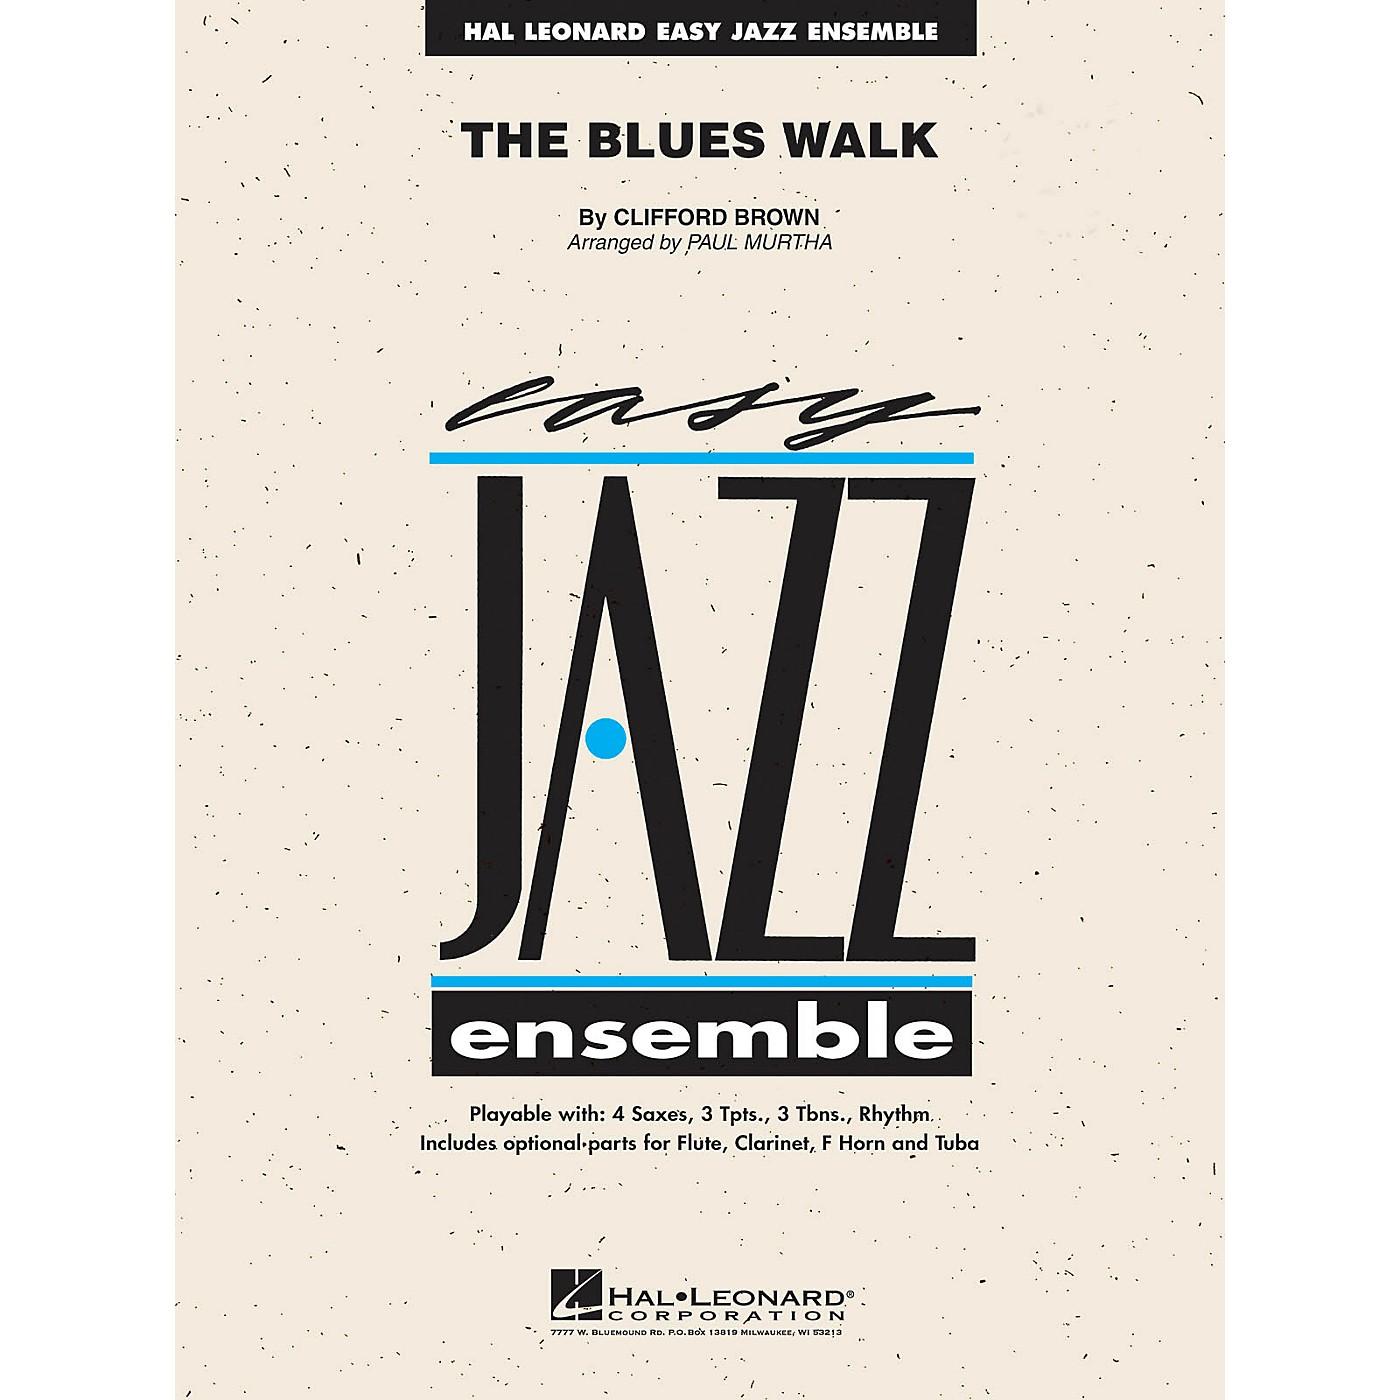 Hal Leonard The Blues Walk Jazz Band Level 2 Arranged by Paul Murtha thumbnail